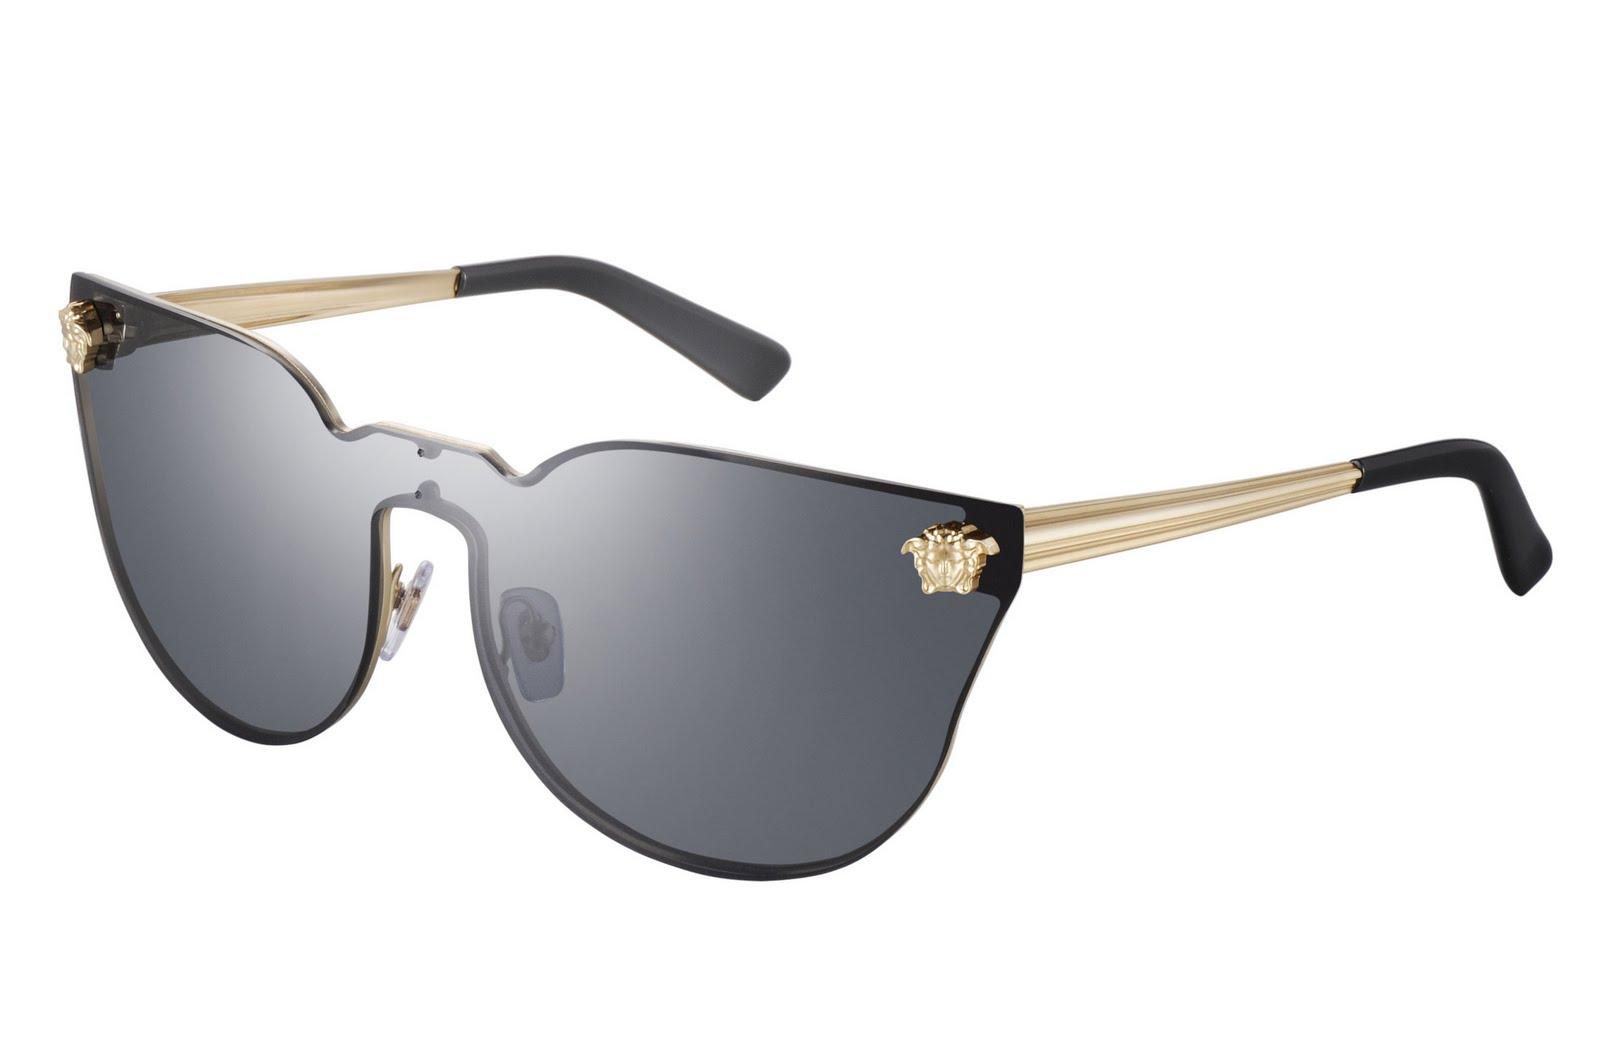 Benetton Sunglasses